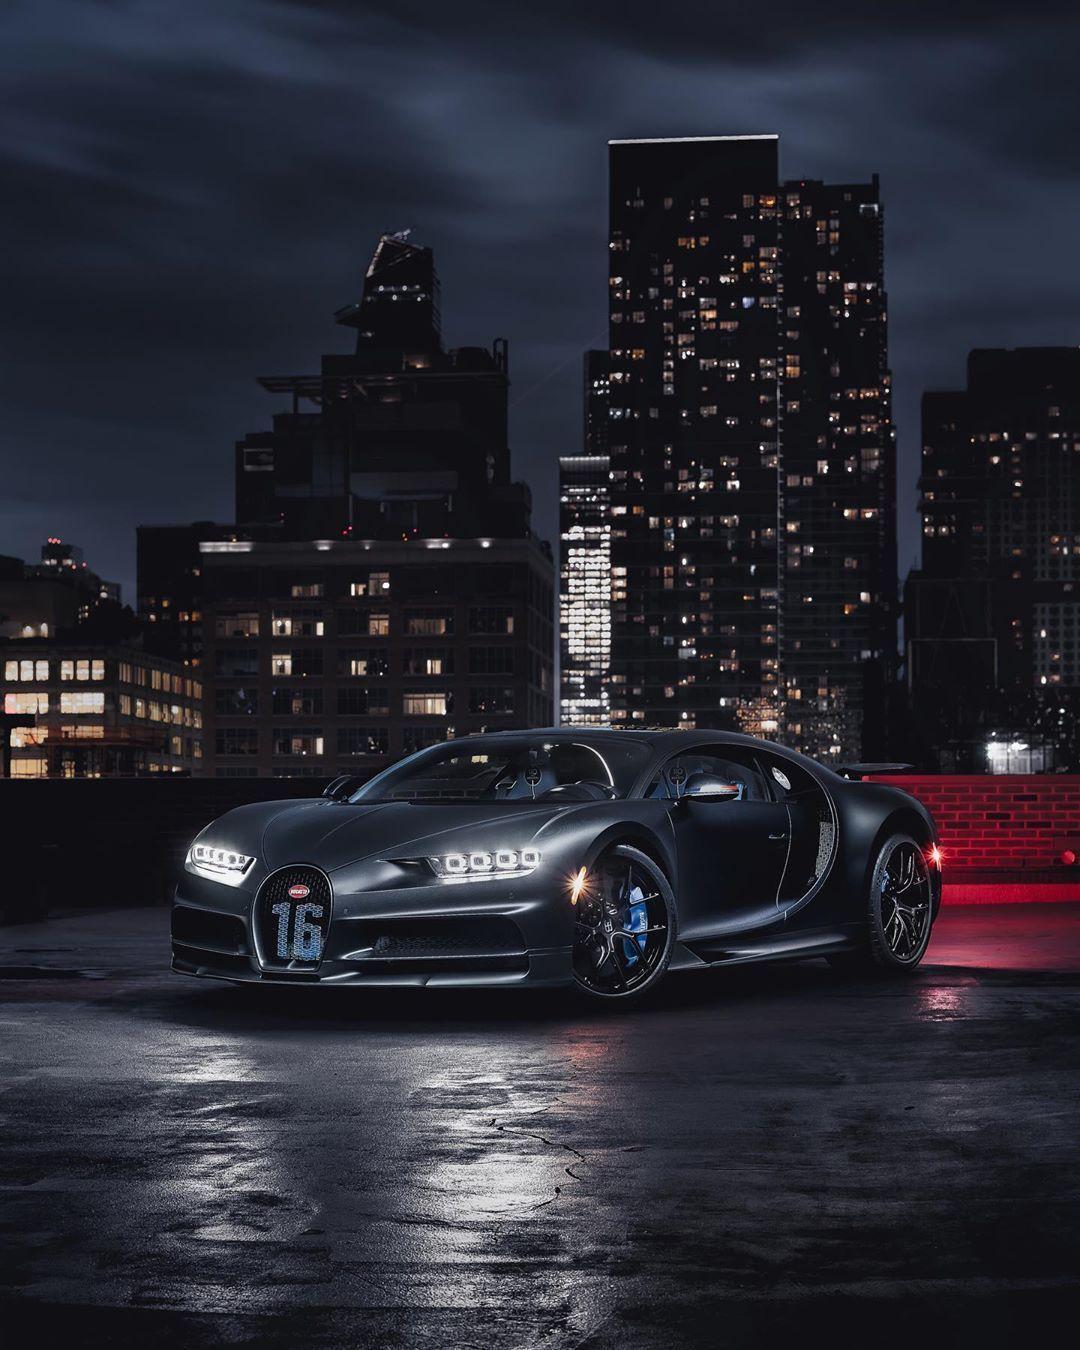 Omg Rate 0 100 In 2020 Sports Car Wallpaper Bugatti Luxury Cars